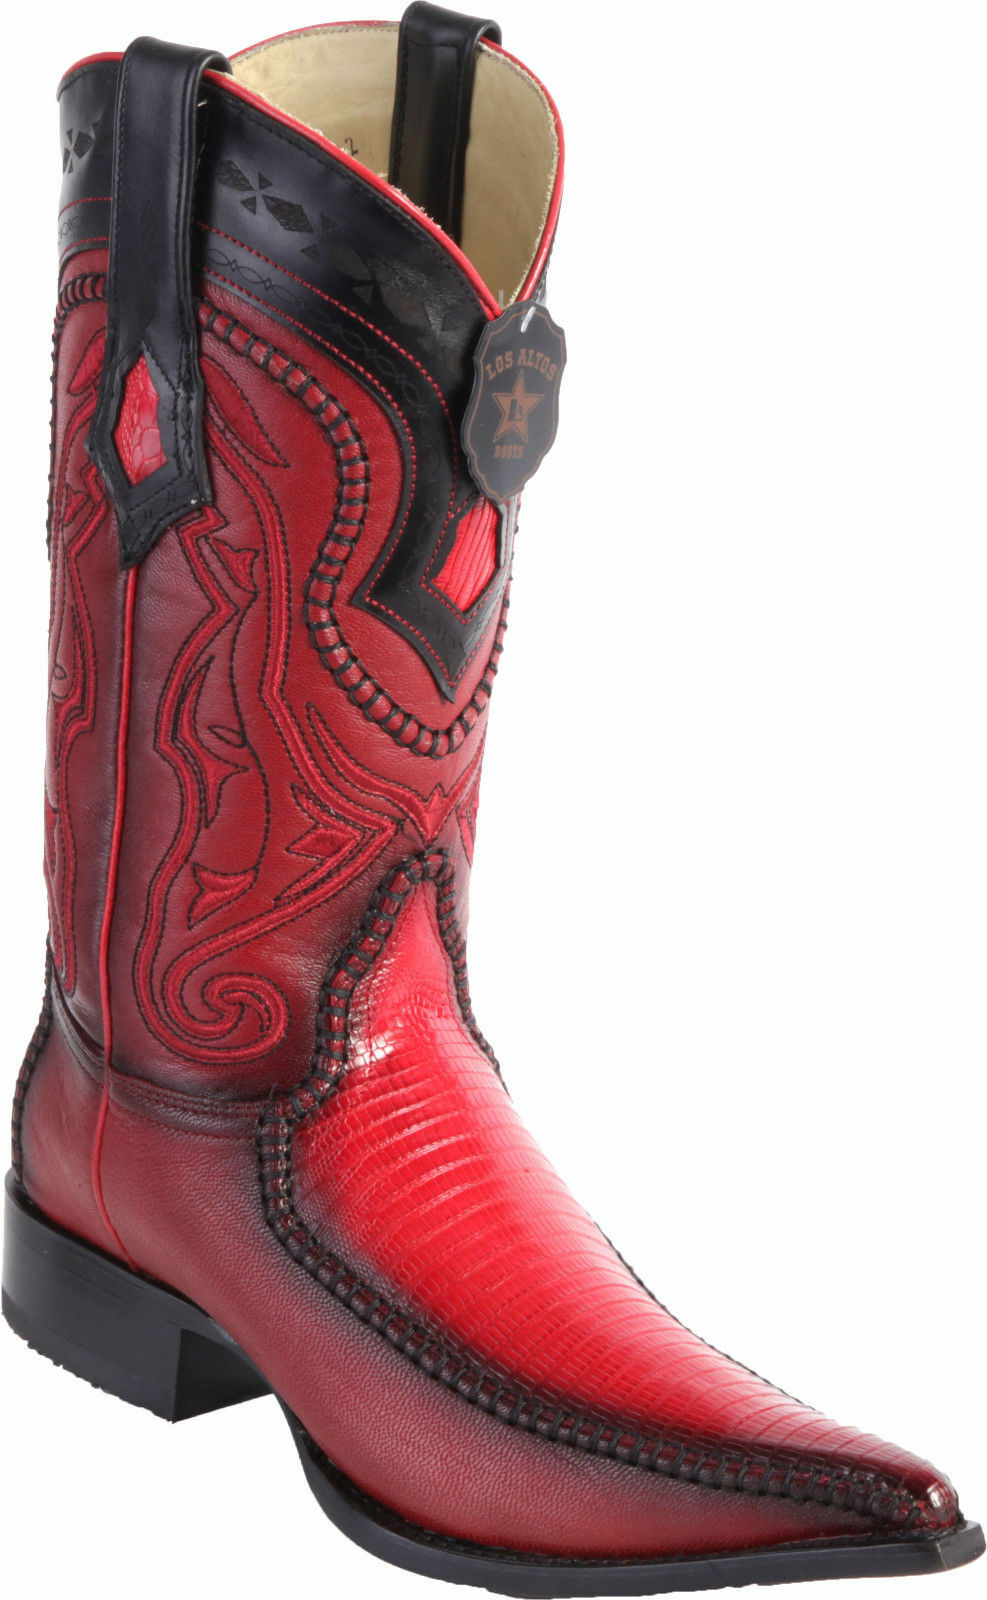 LOS ALTOS RED GENUINE TEJU LIZARD 3X 3X 3X TOE WESTERN COWBOY BOOT EE d000ef